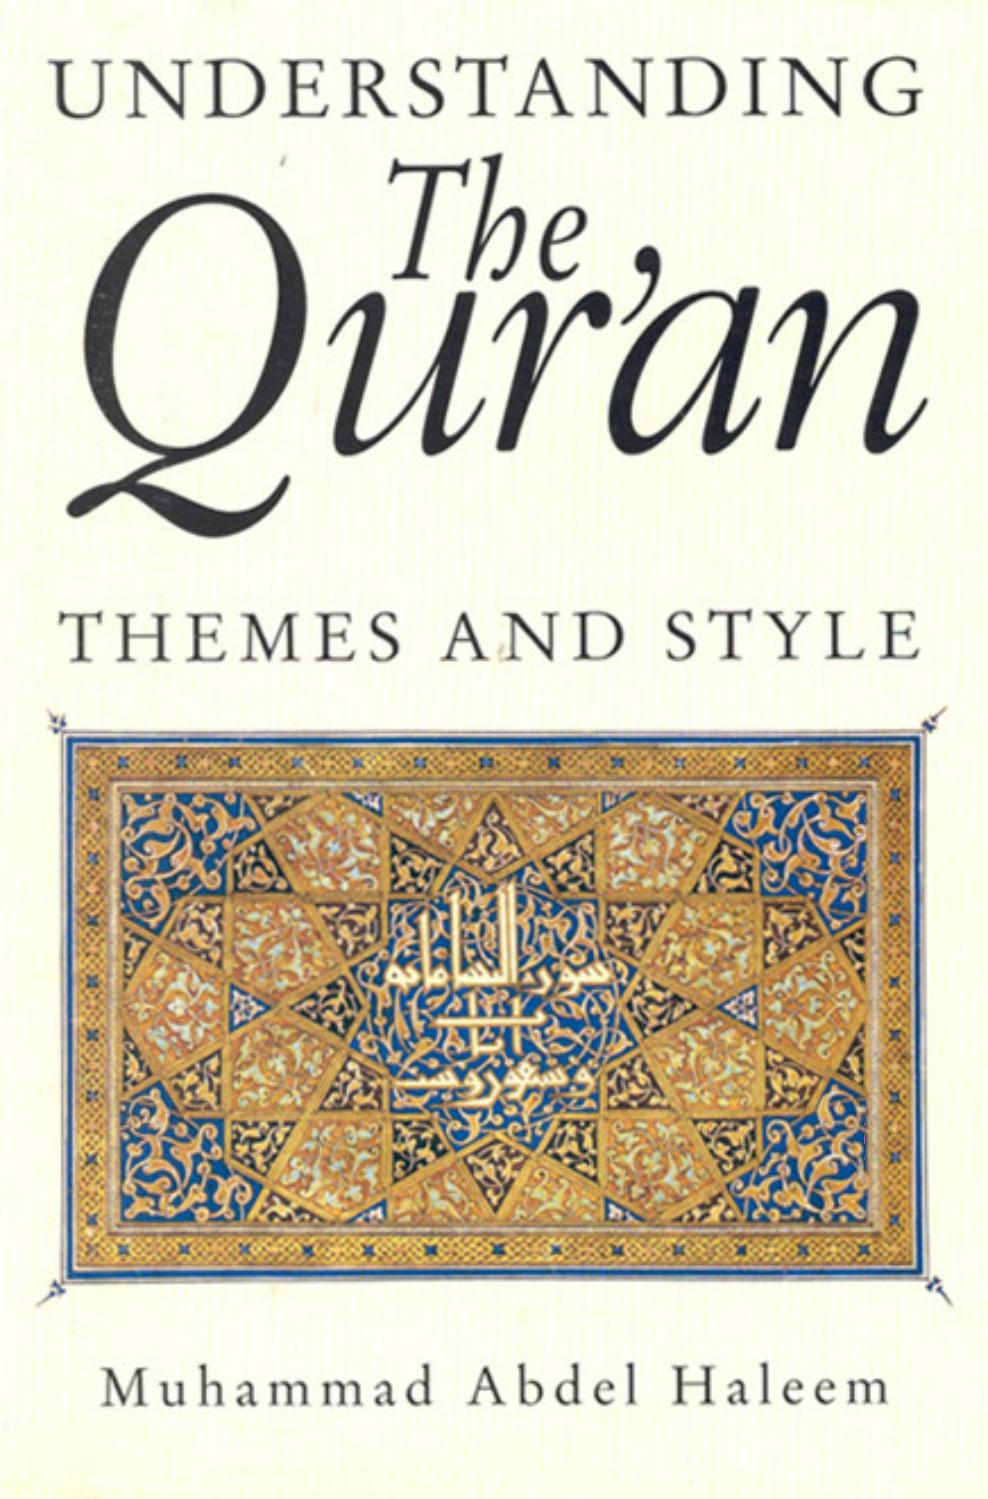 Understanding the Quran - Muhammad Abdel Haleem by kruntil - issuu